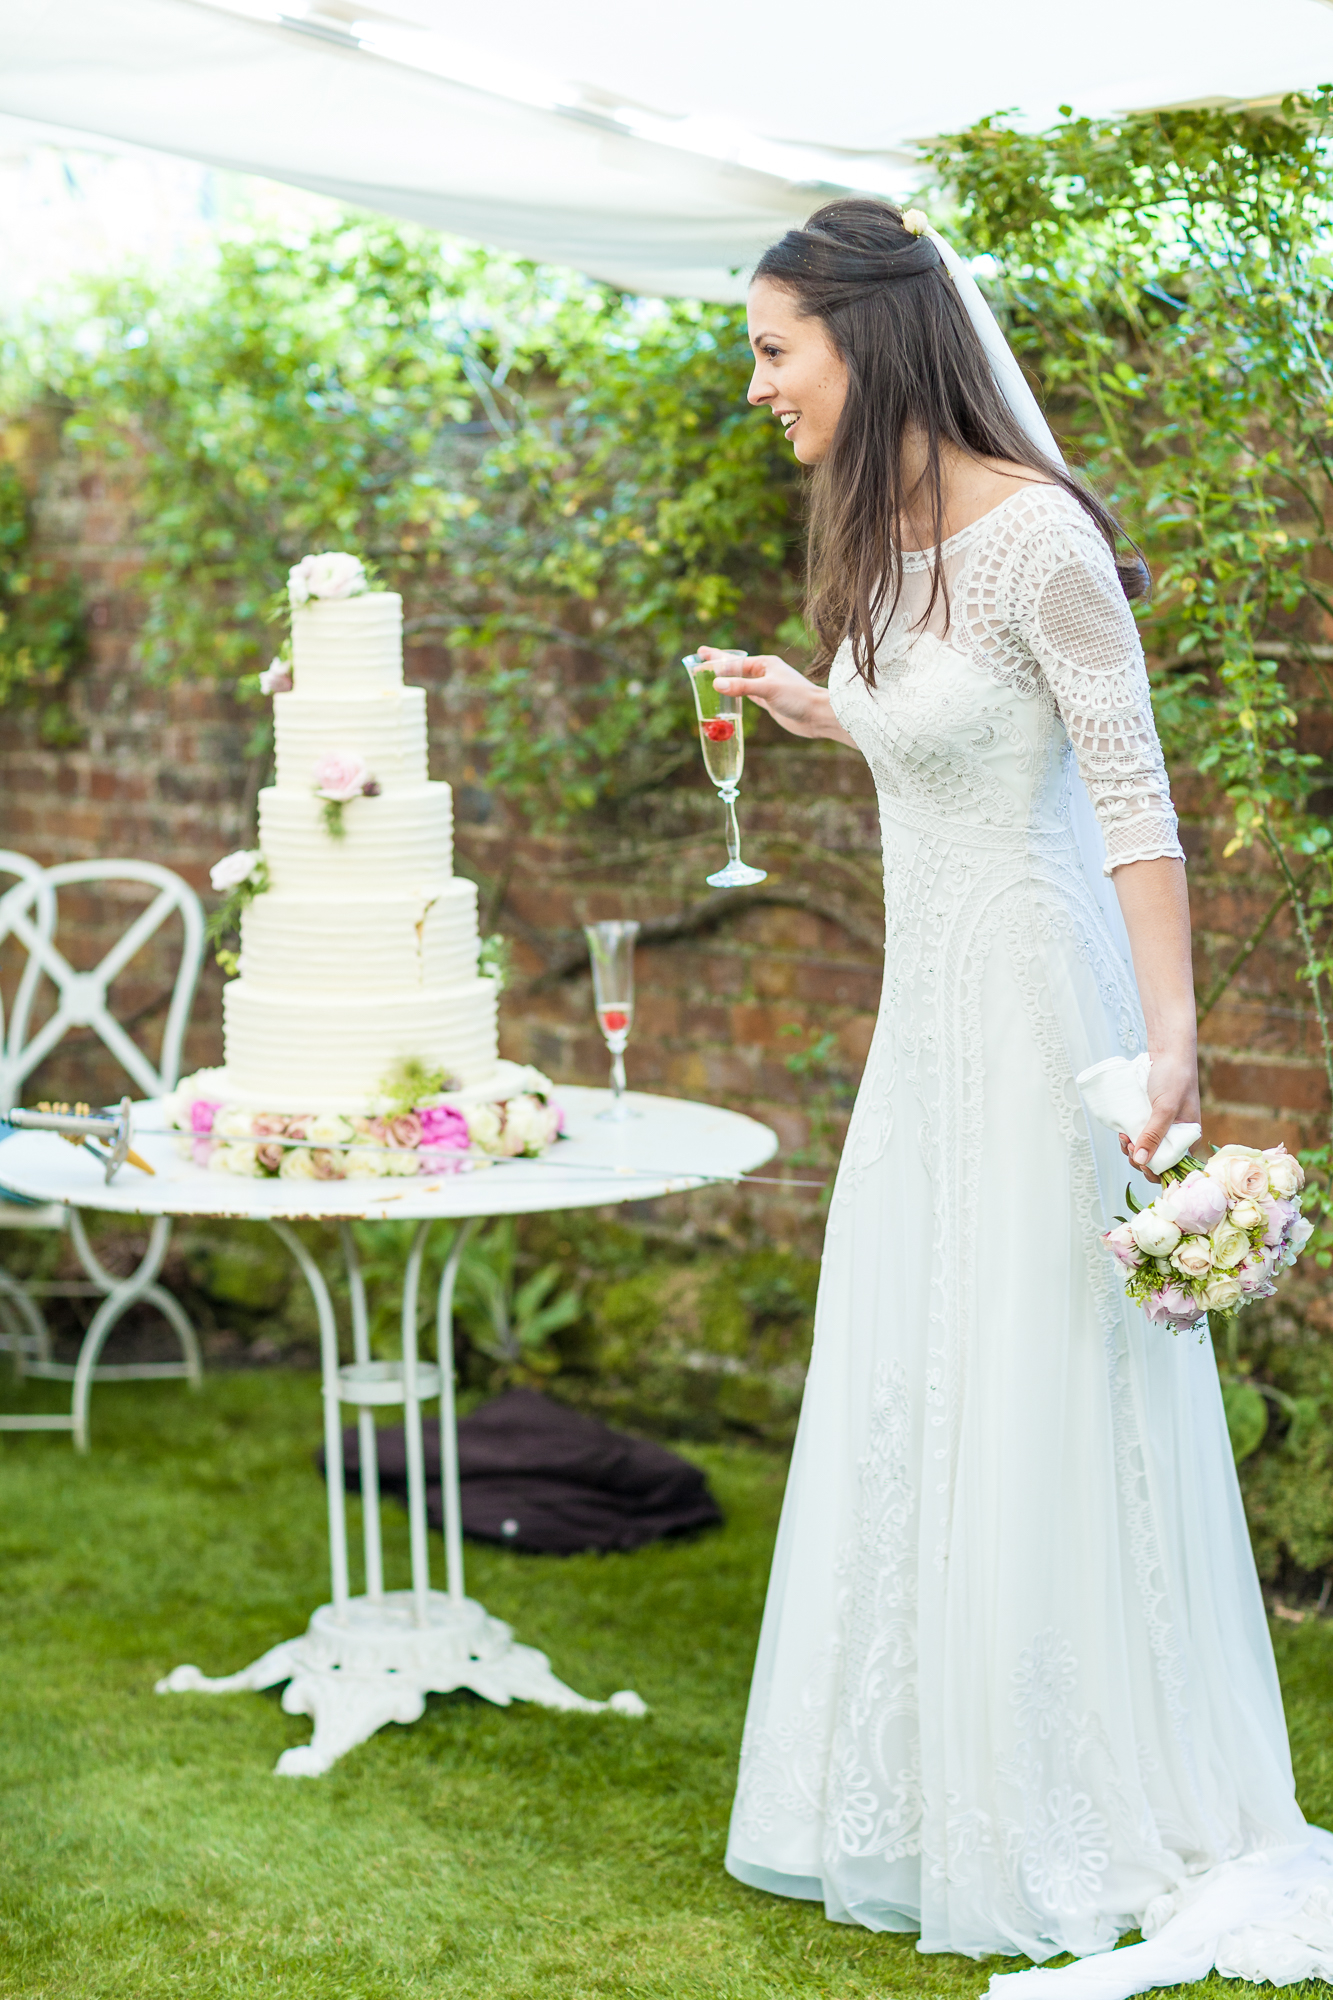 wedding photography bridal stride (7 of 8).jpg